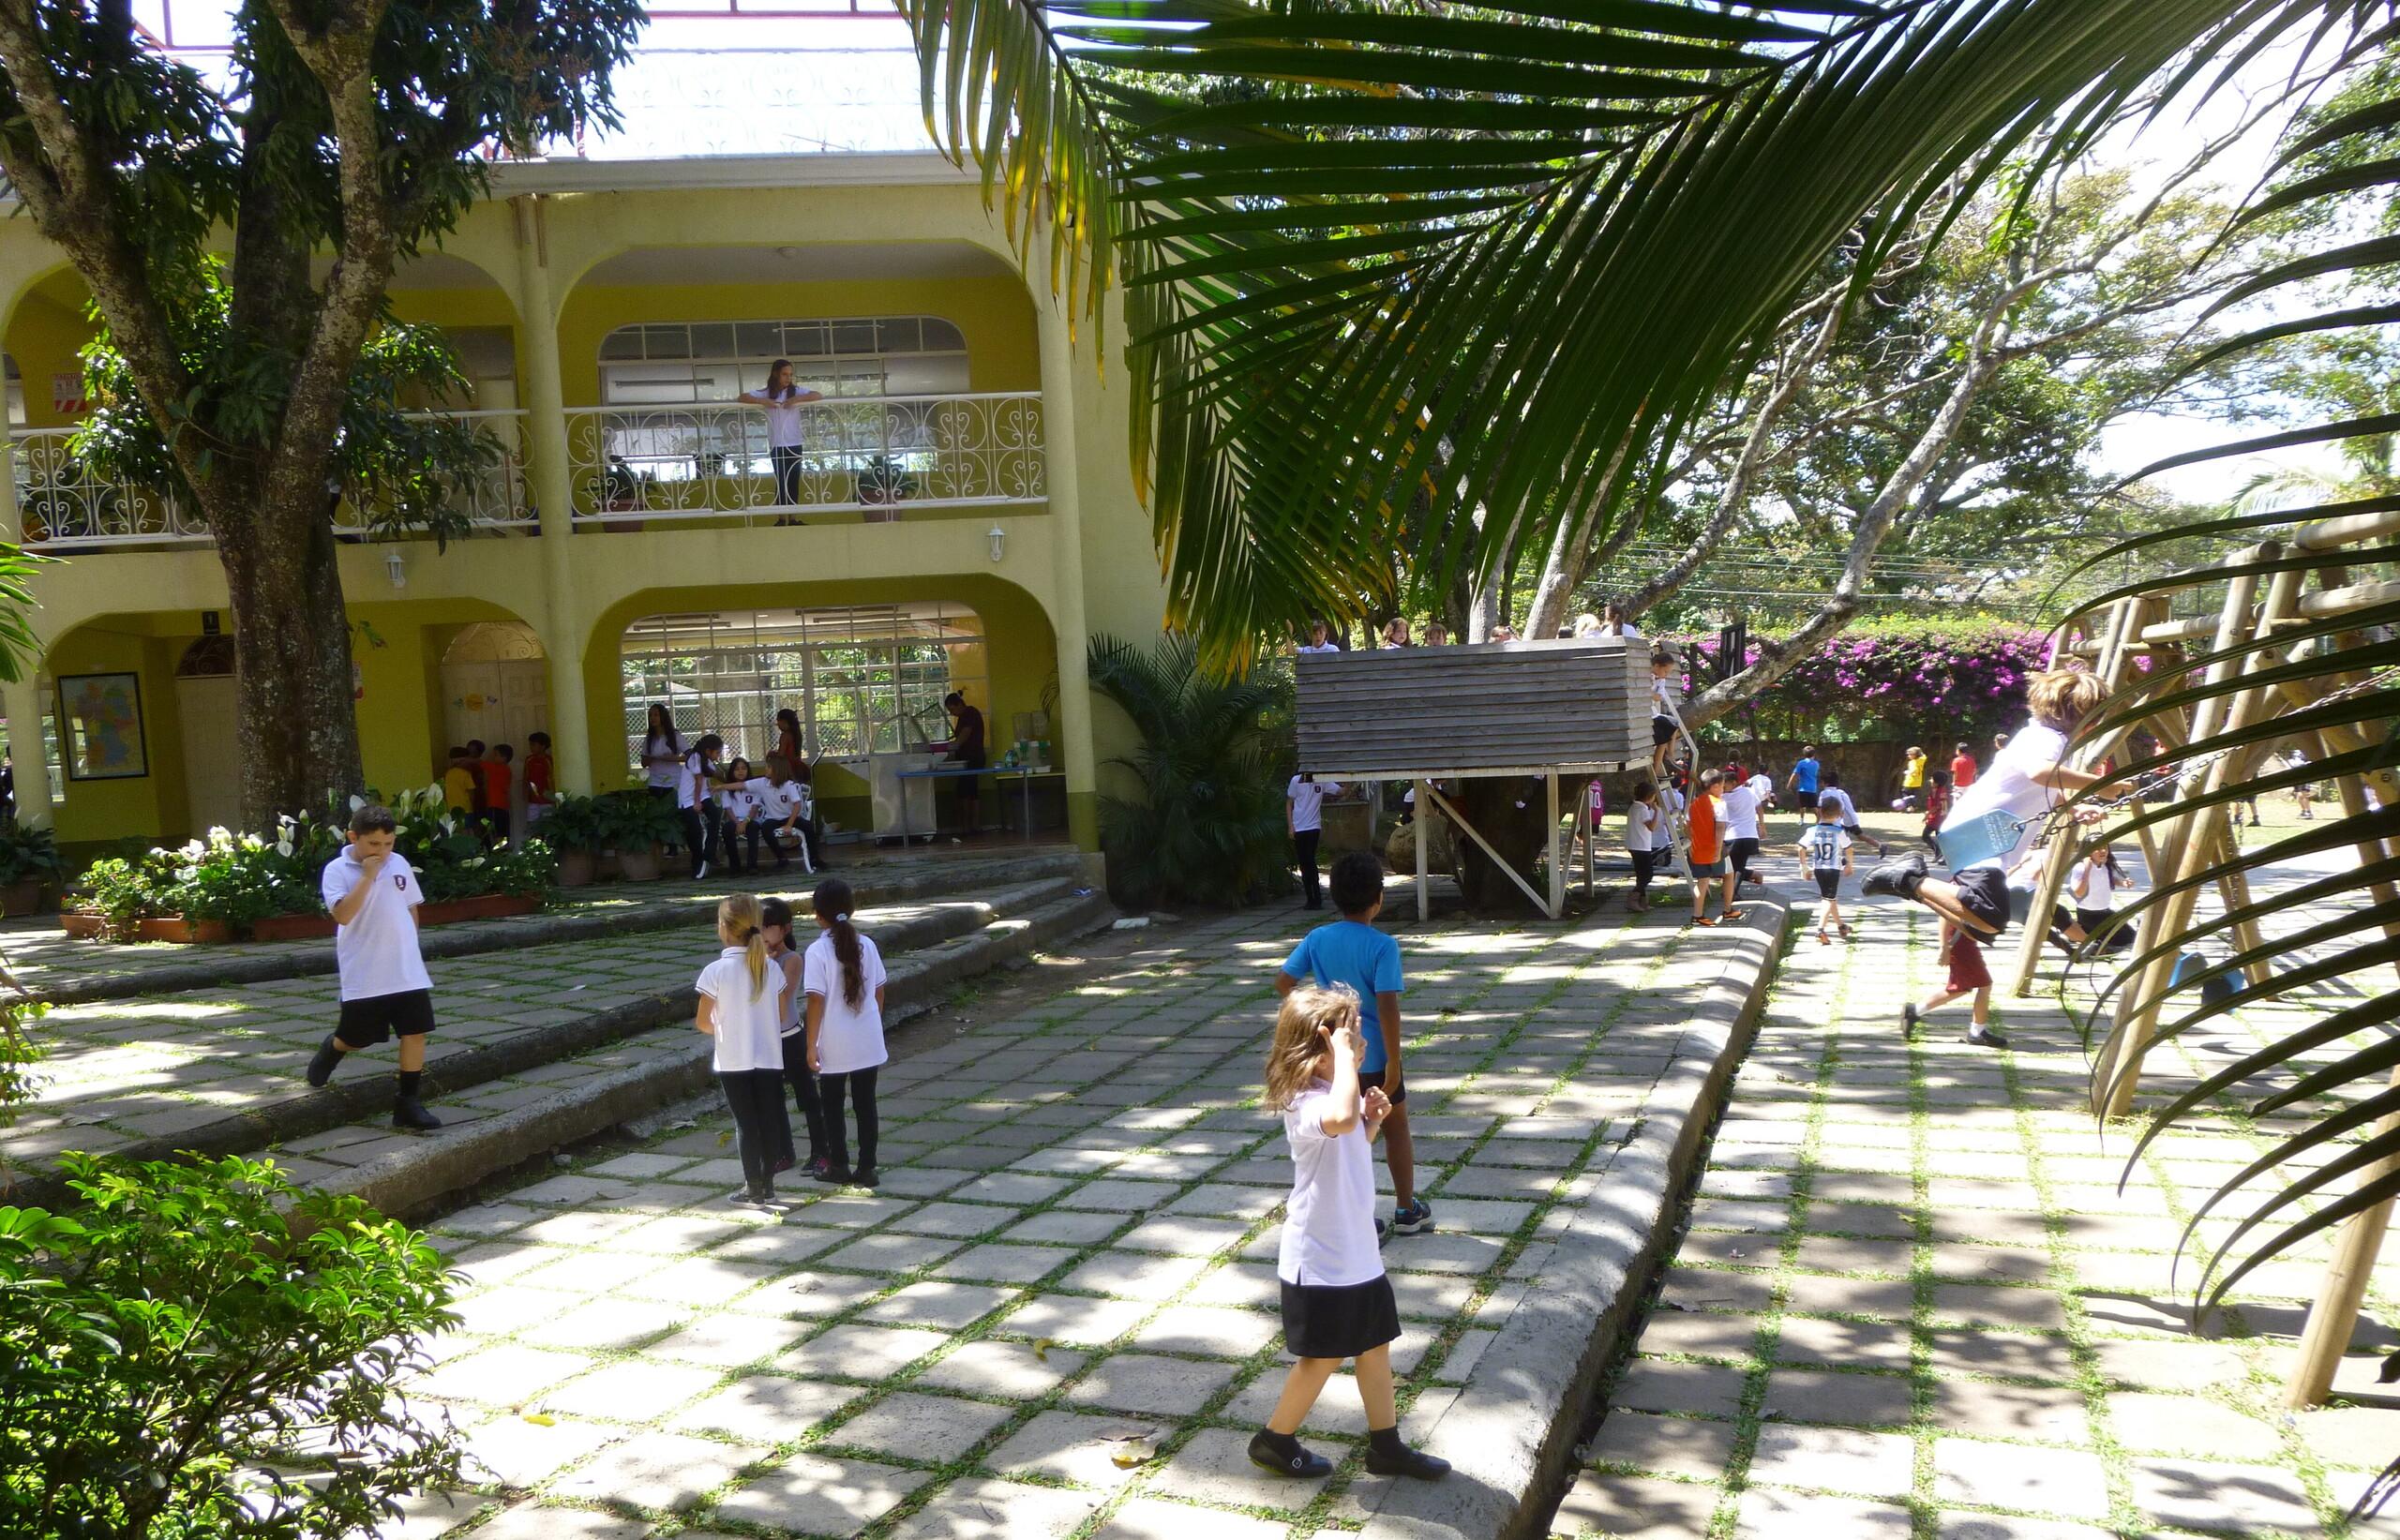 Colegio Franz Liszt in San José (Costa Rica)